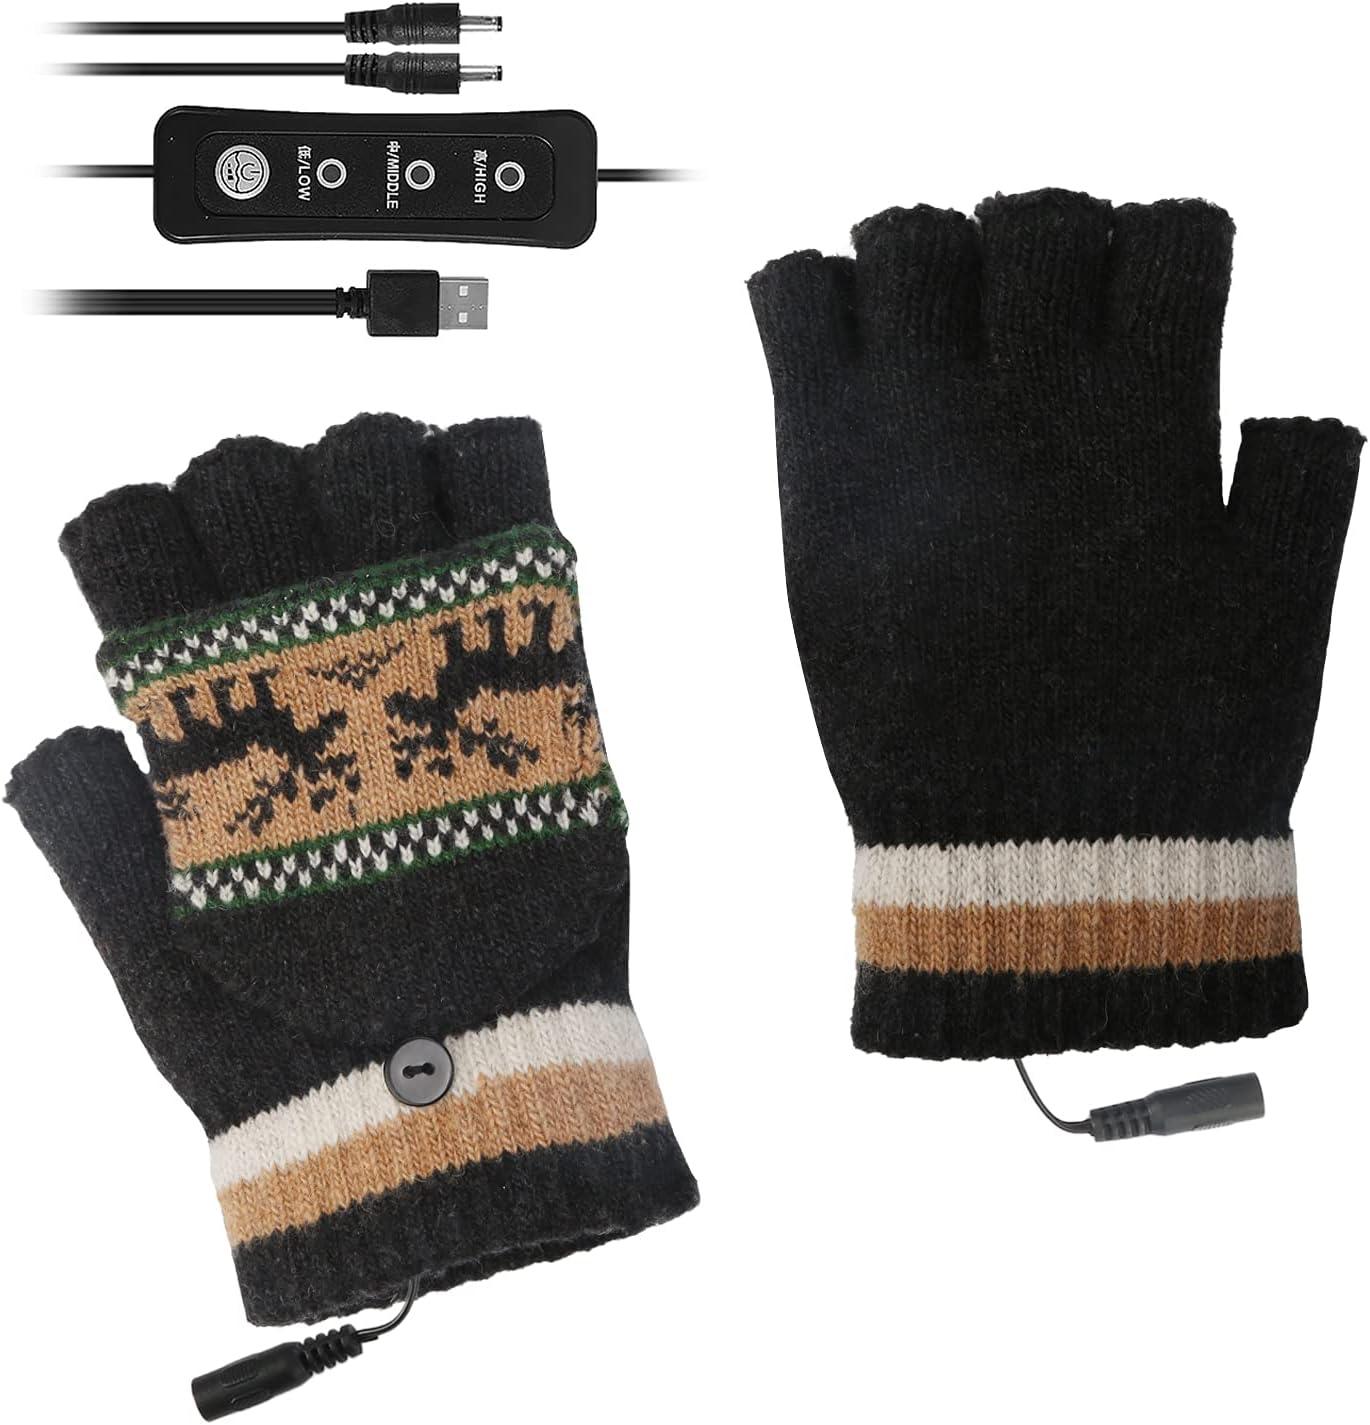 OhhGo Heated Gloves Fingerless Men Ultra-Cheap Deals for Beauty products Rech